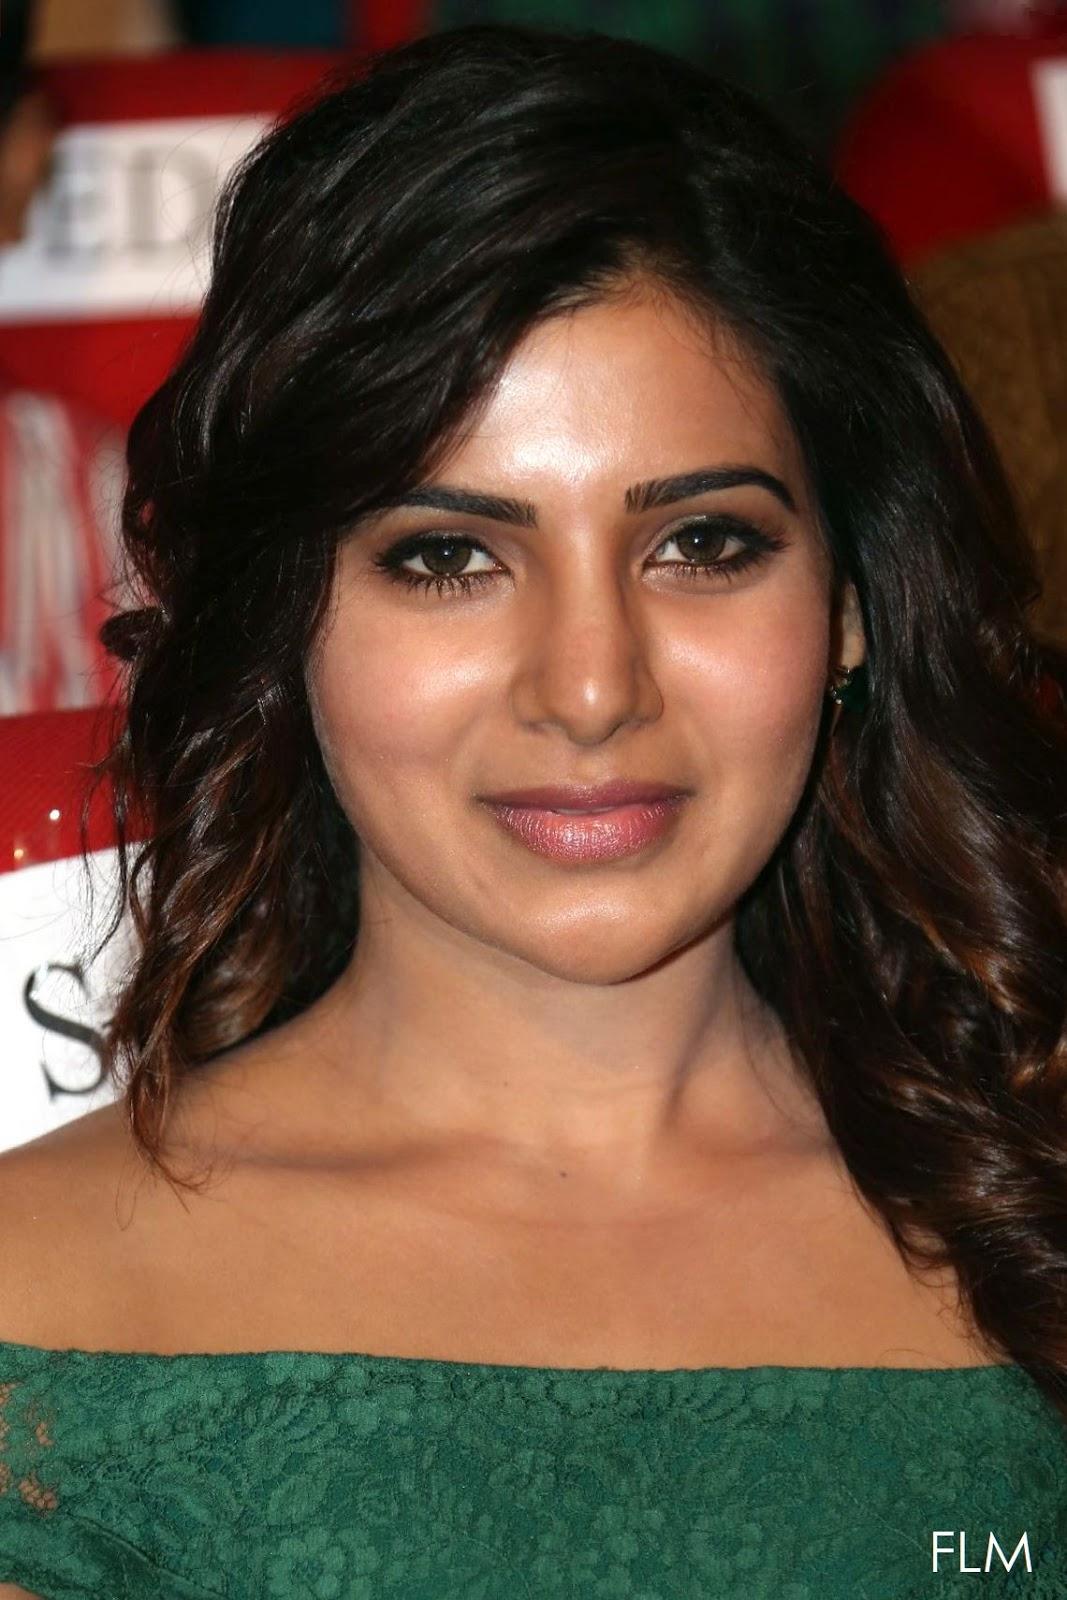 Samantha Ruth Prabhu In Green Top